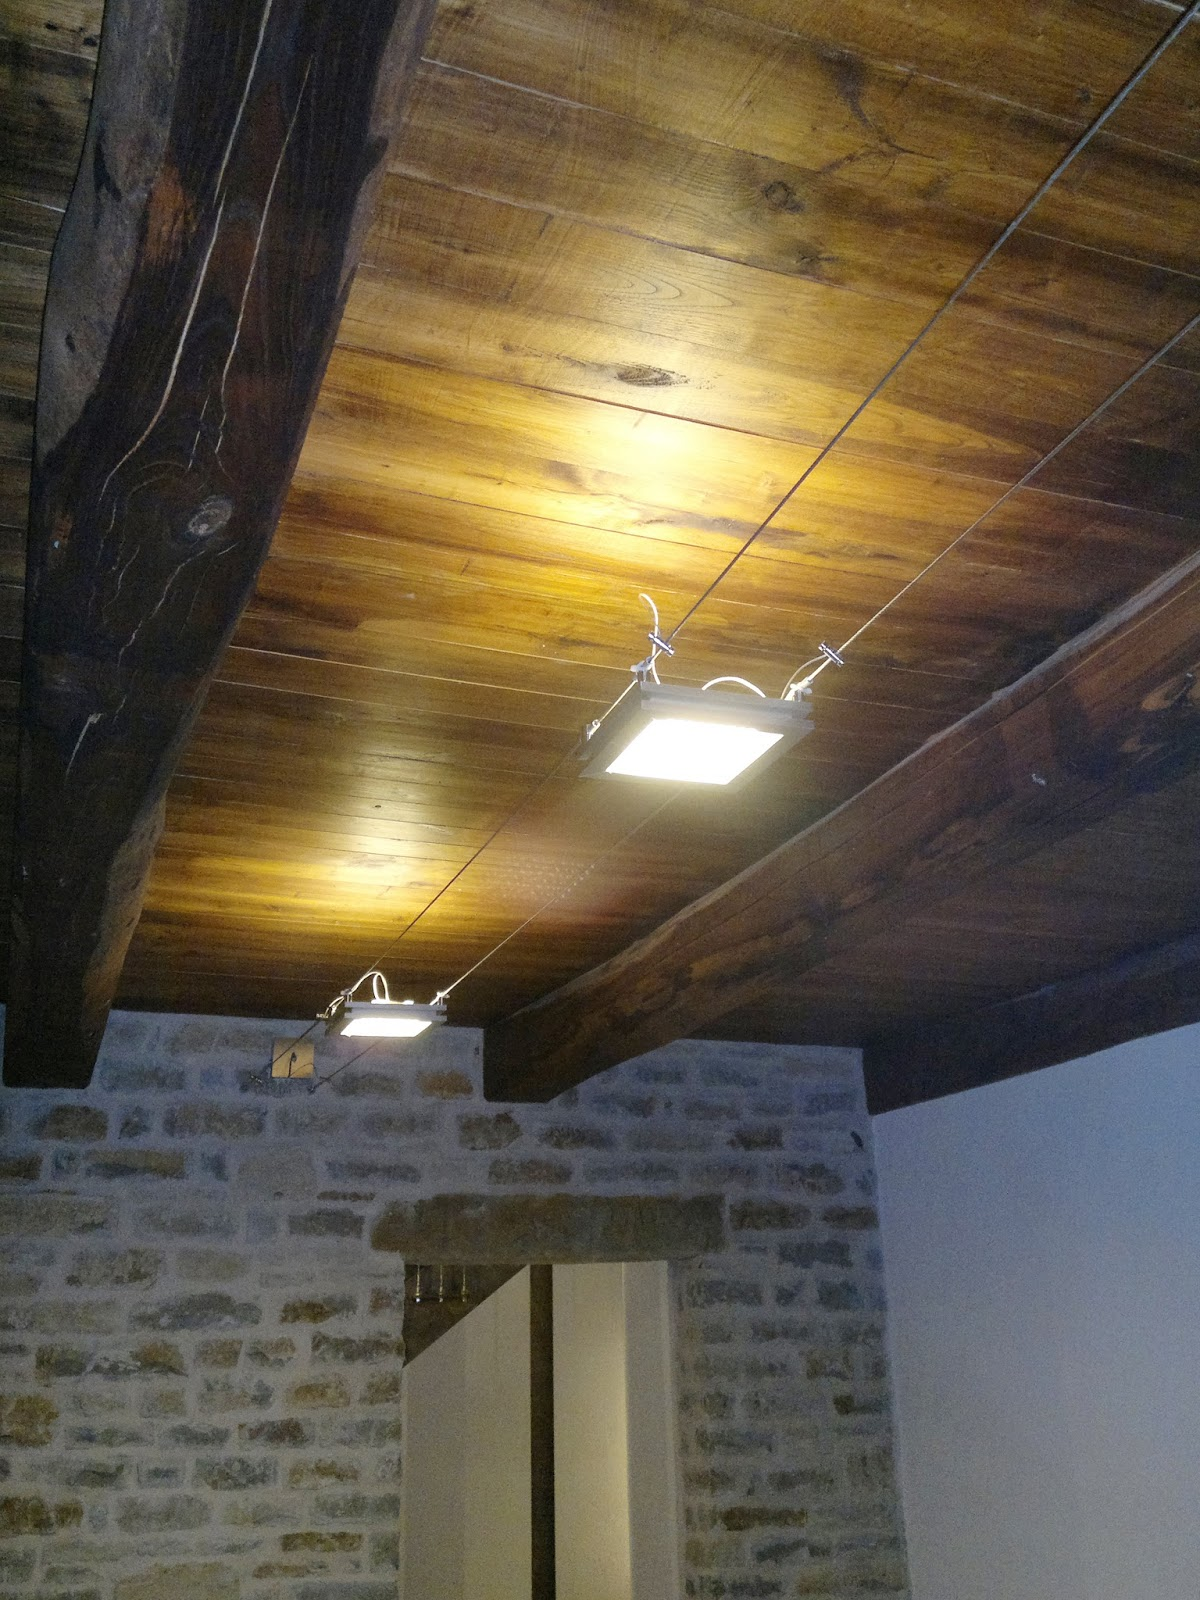 Illuminazione Led casa: lluminare a Led una mansarda, illuminare a Led ambien...